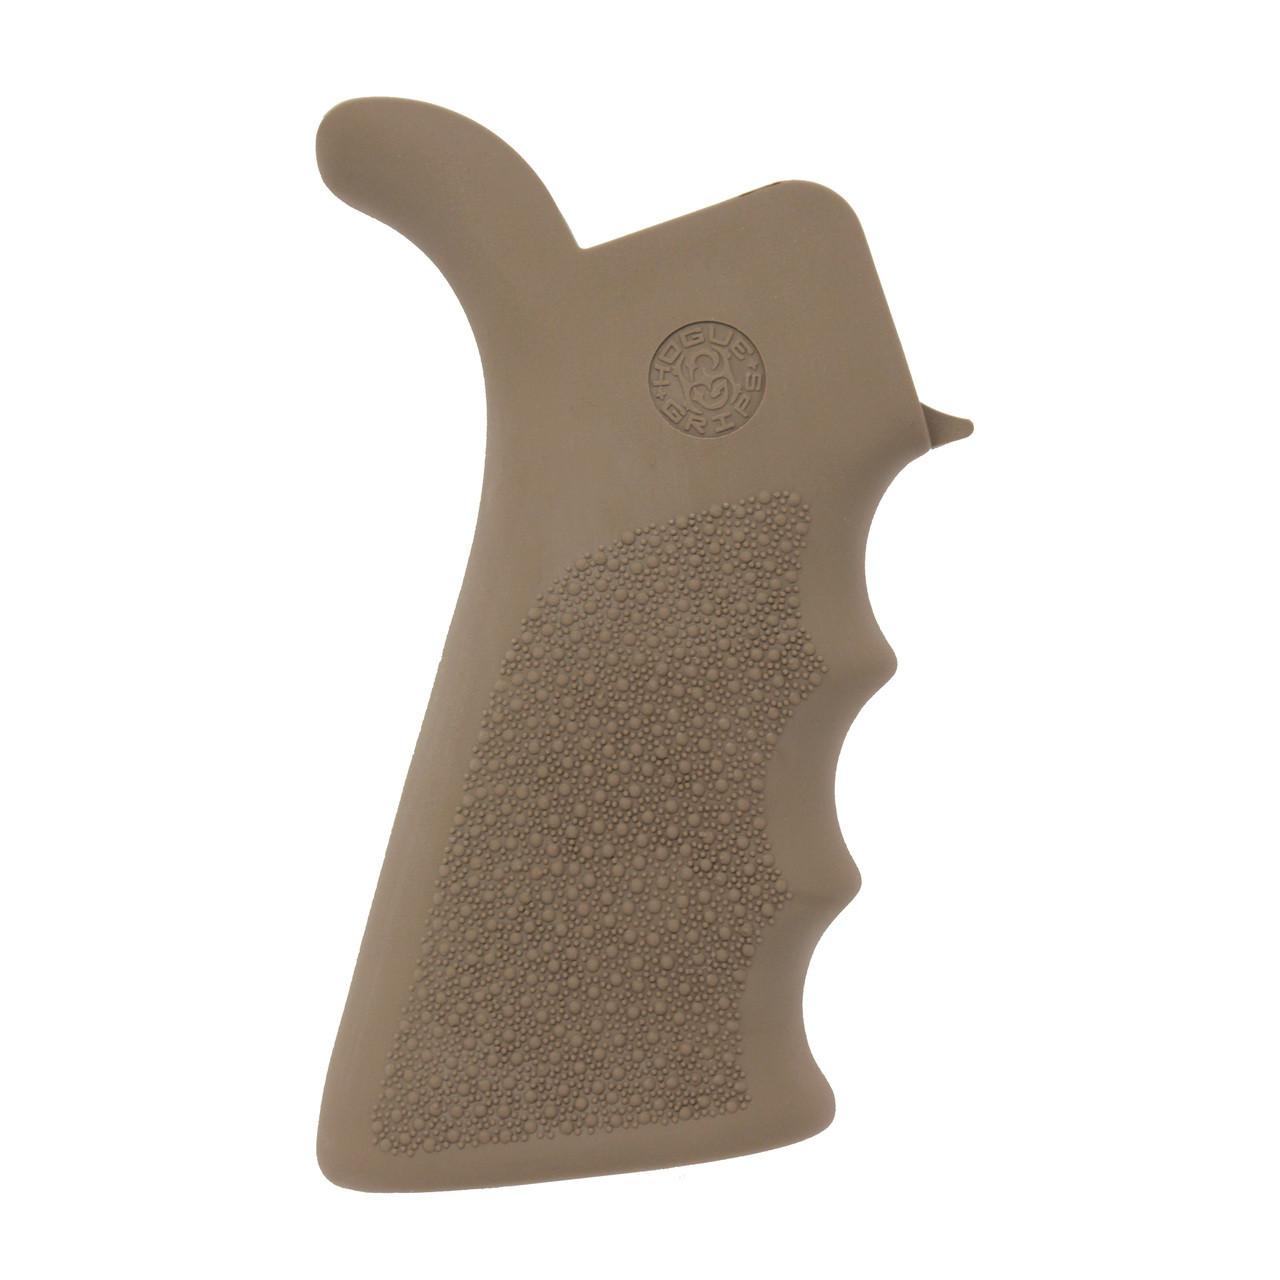 Hogue AR-15 Rubber Grip Beavertail w/Finger Grooves Desert Tan